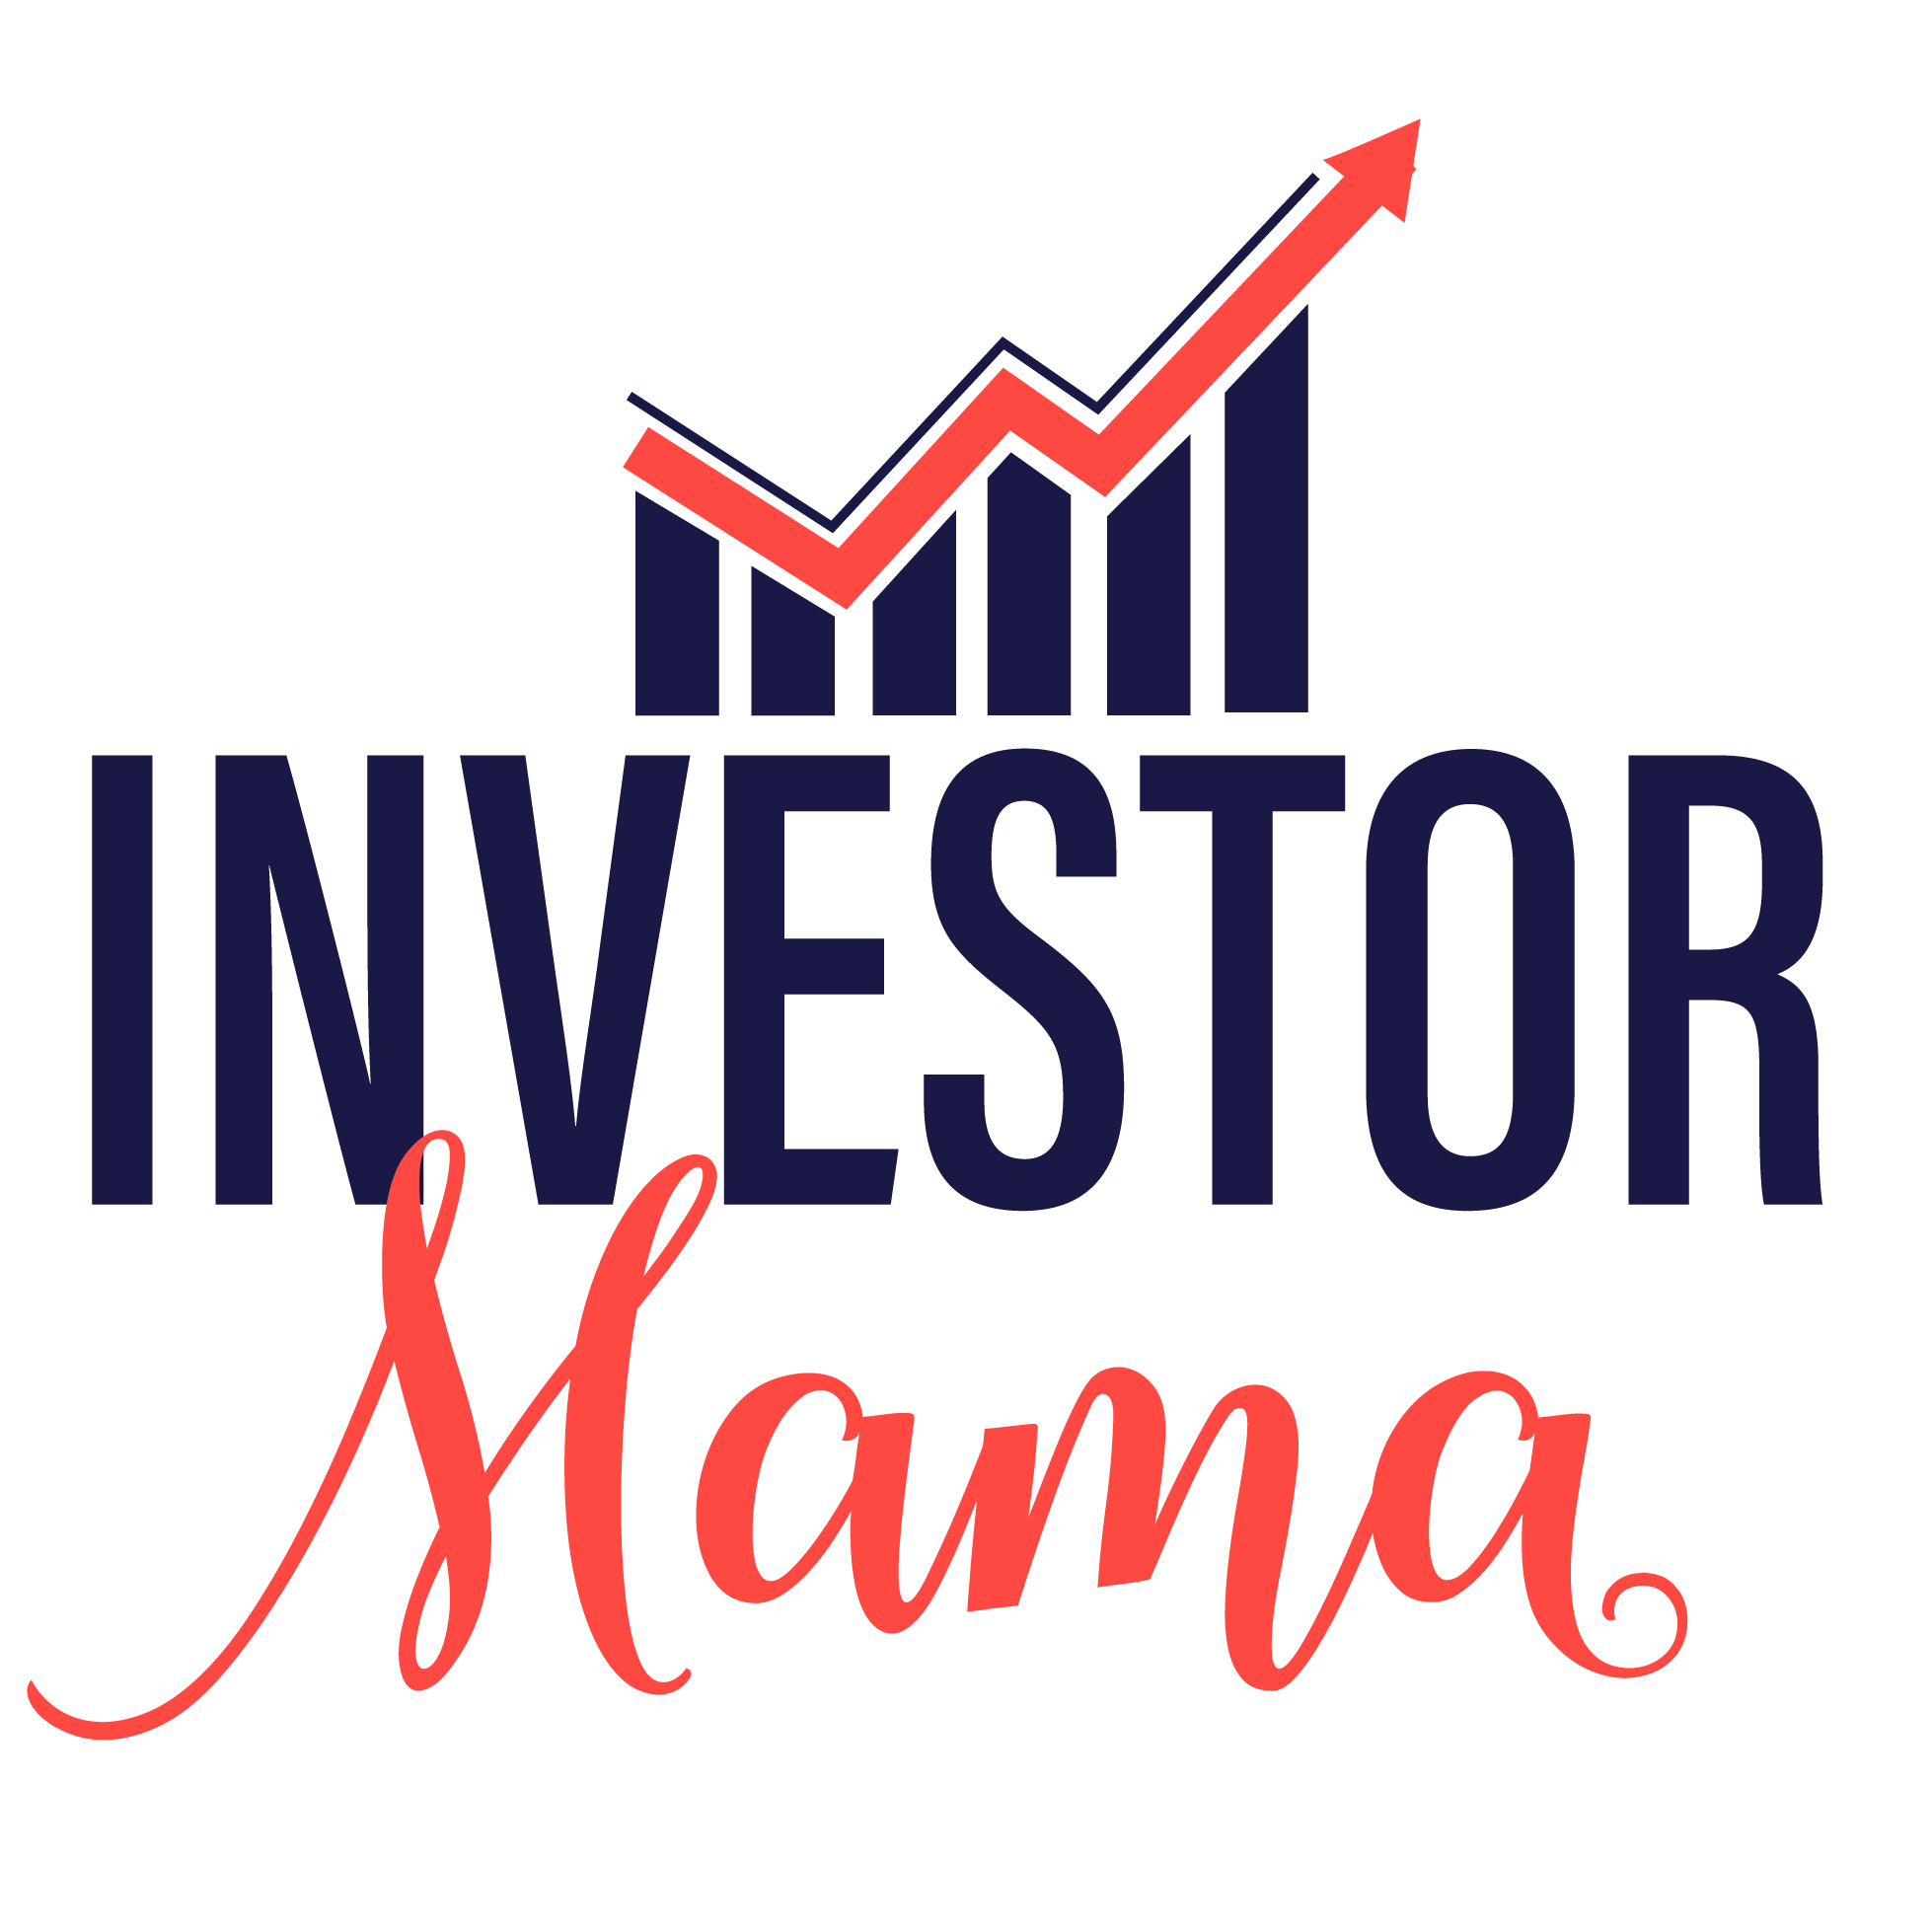 Investor Mama